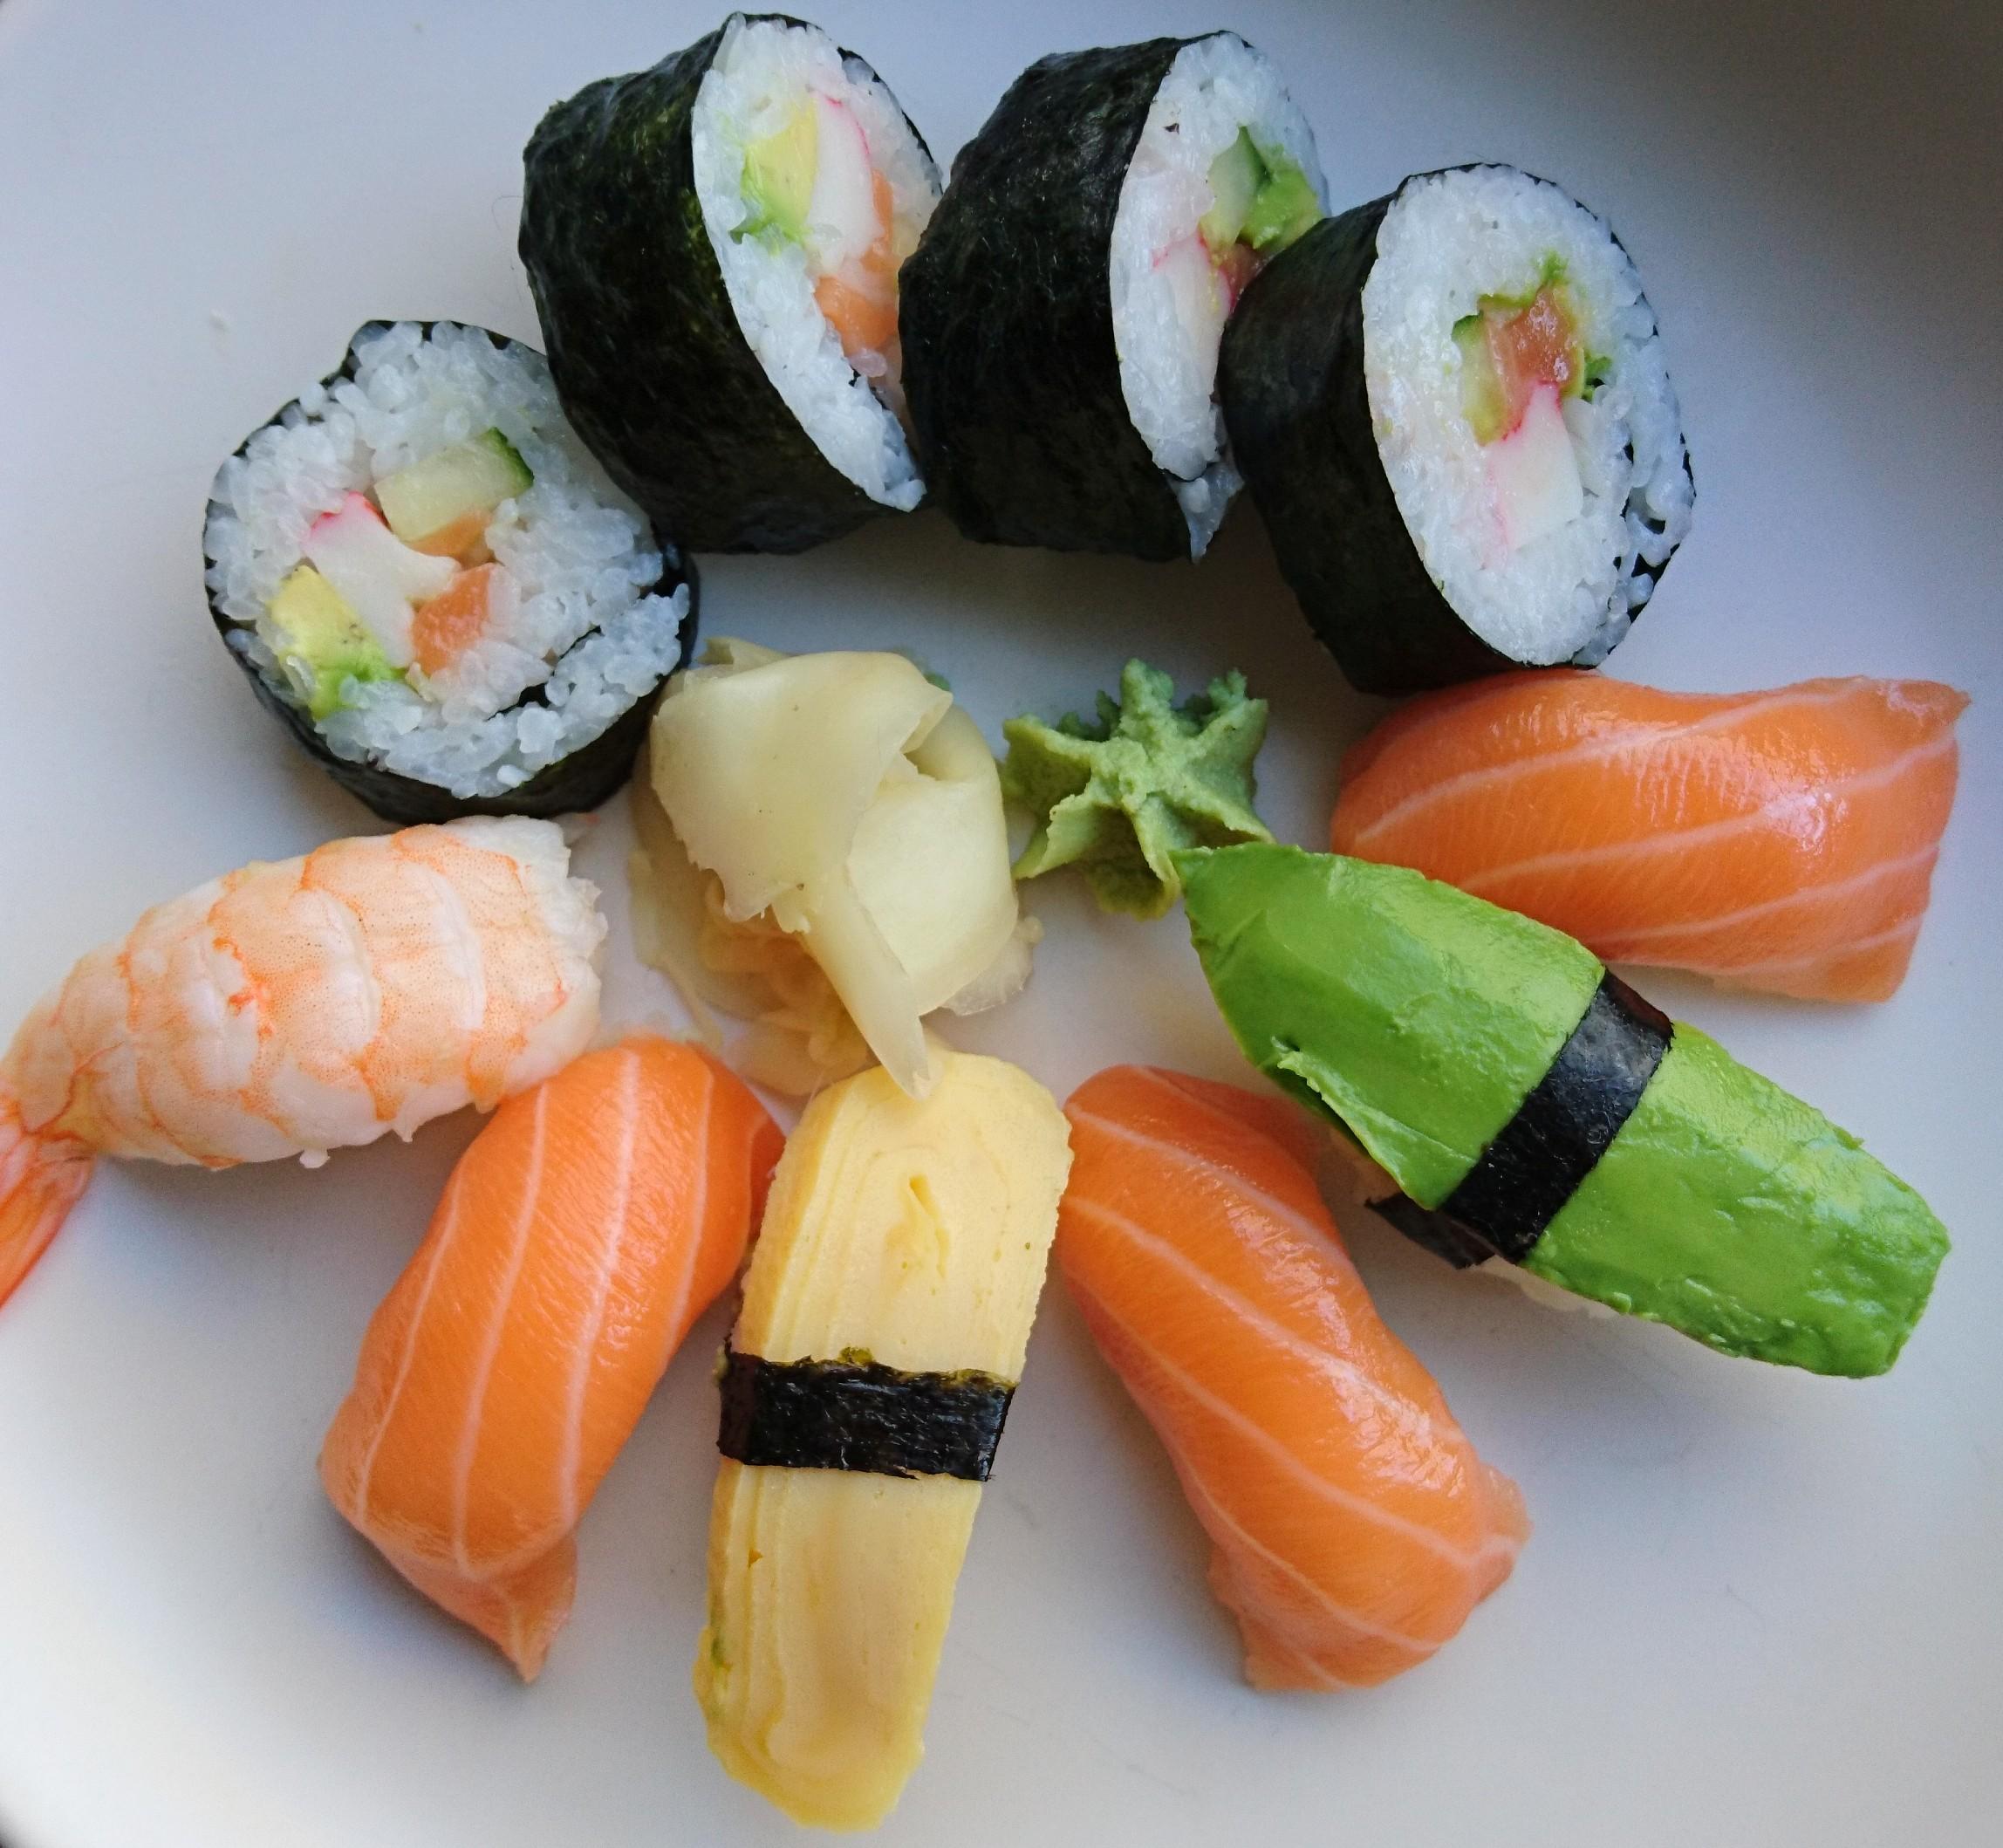 sushi light xperia x new webb